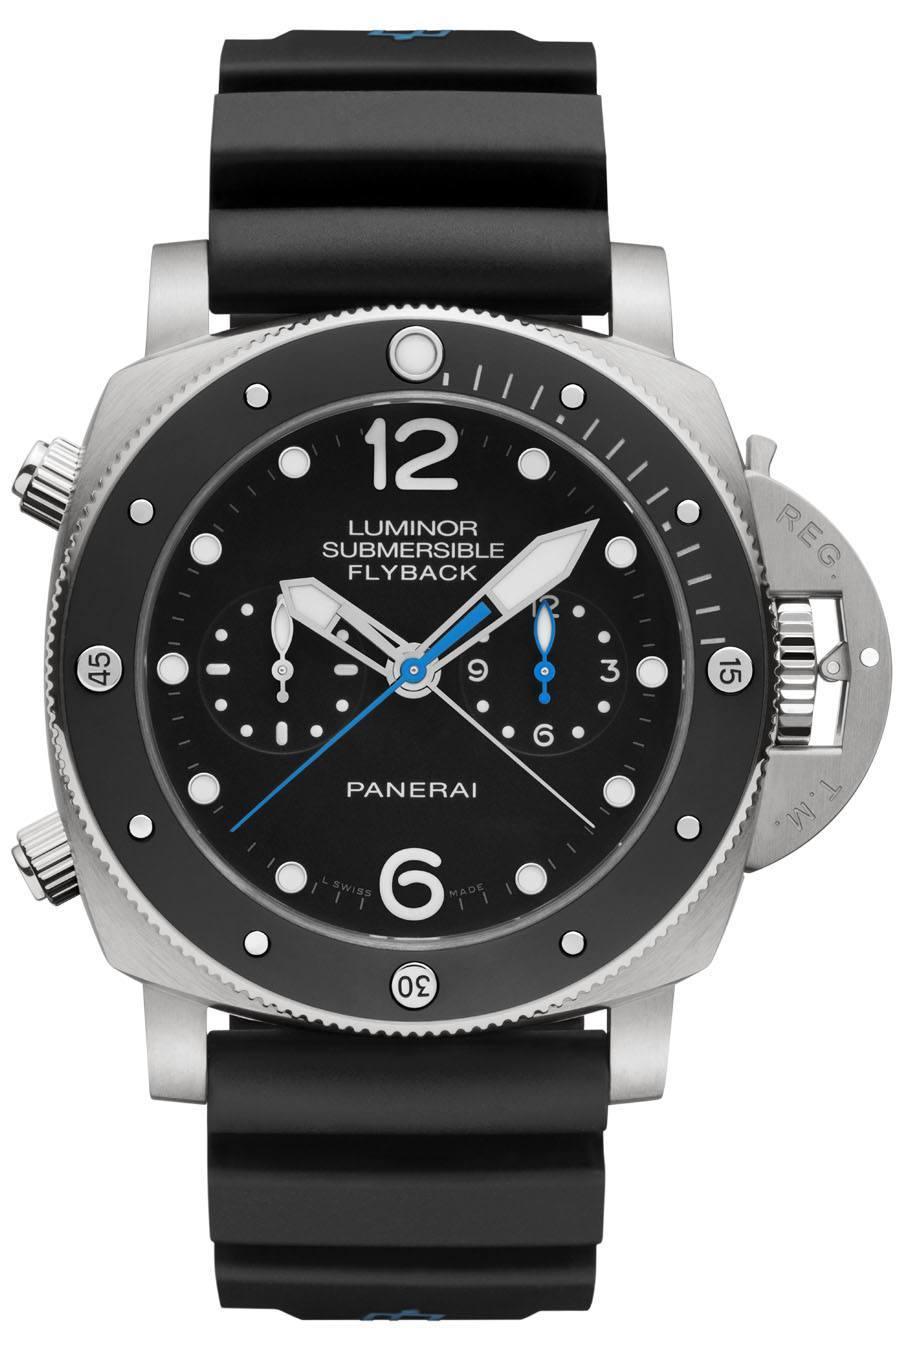 Panerai: Luminor Submersible 1950 3 Days Chrono Flyback Automatic Titanio